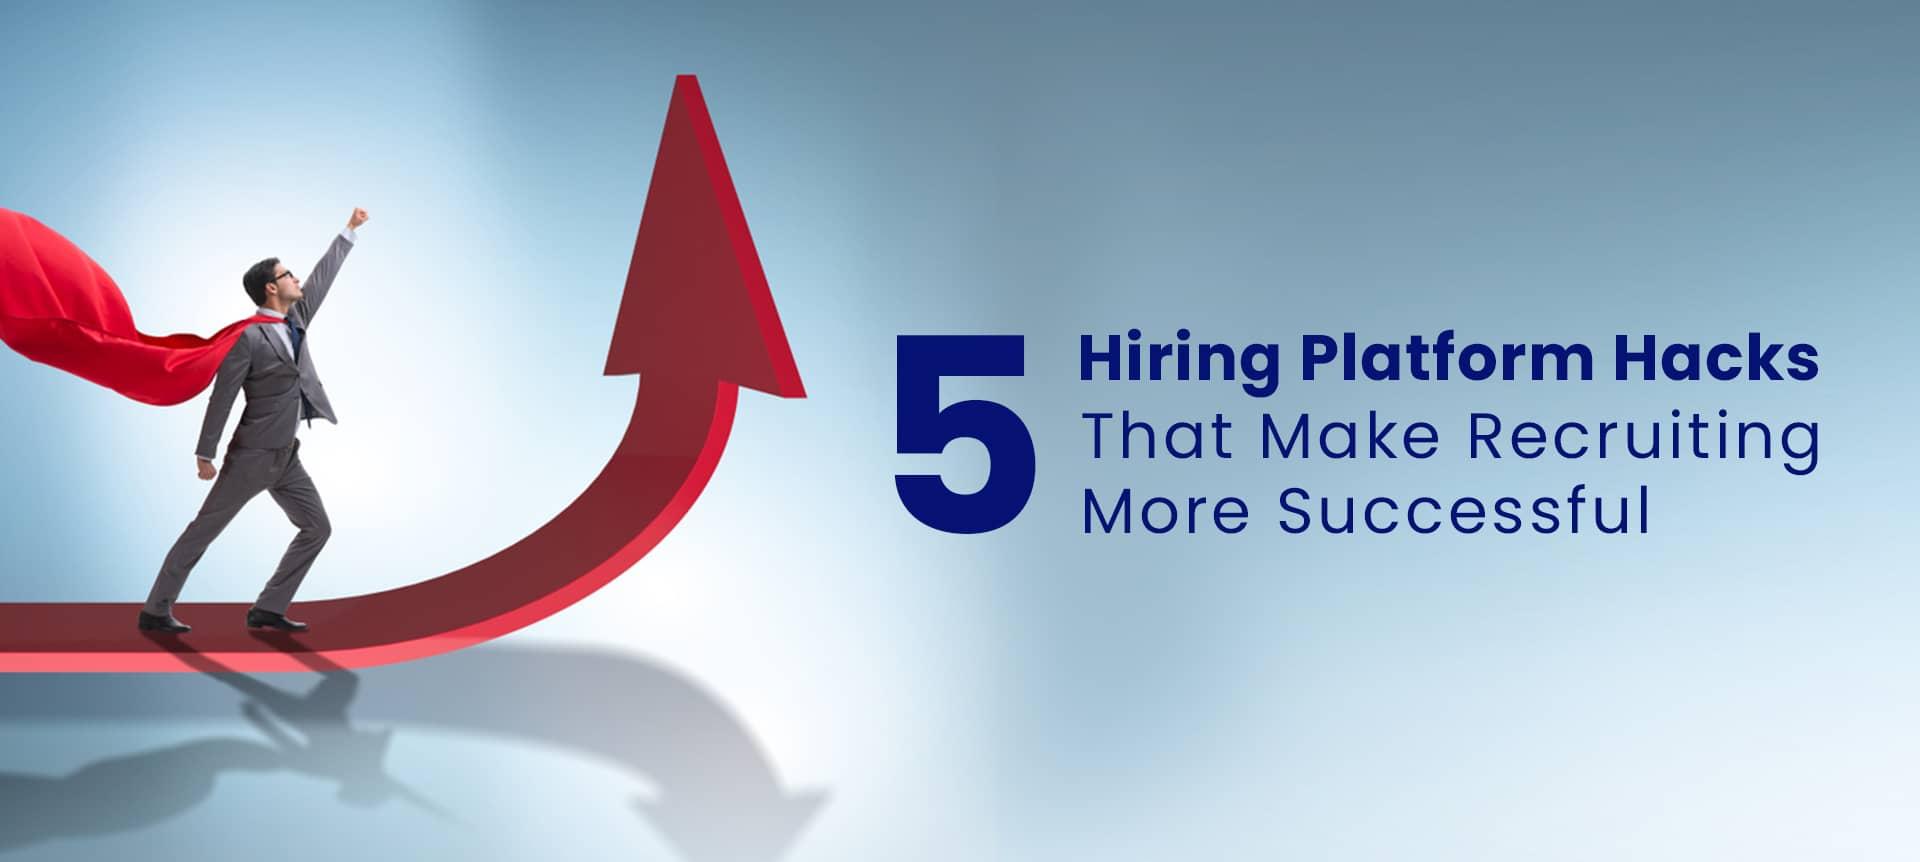 recruiter using a hiring platform